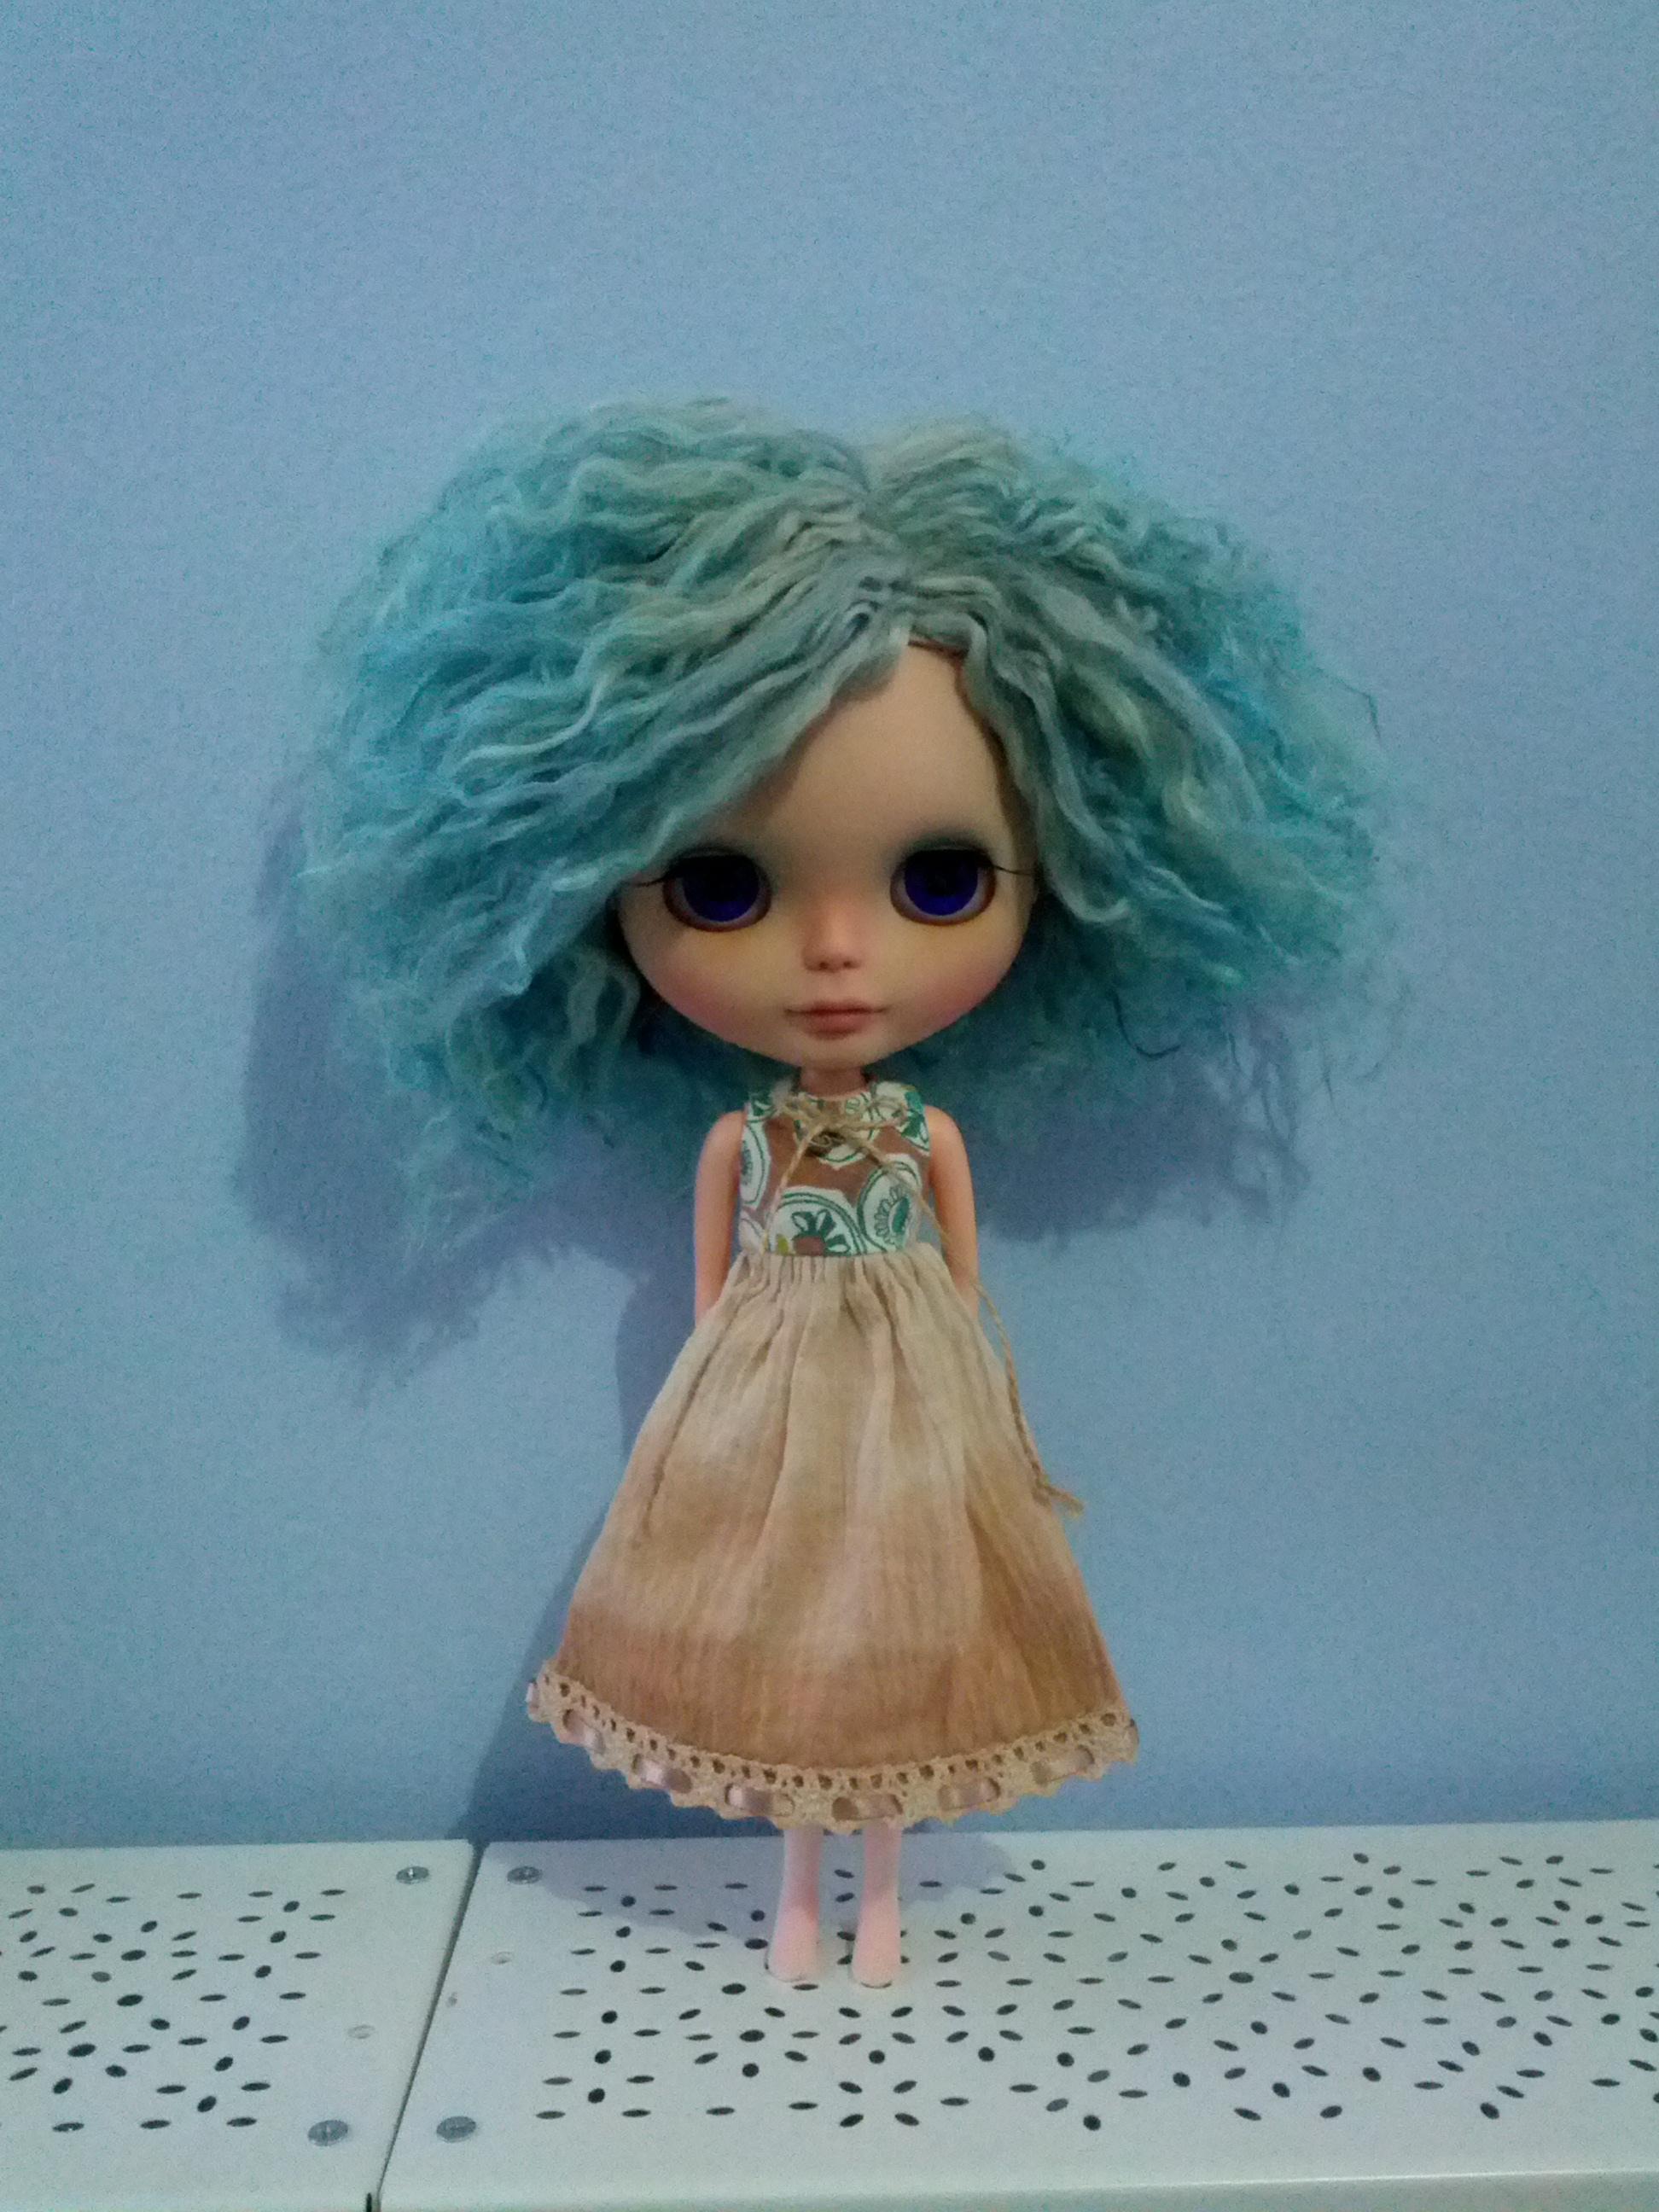 Blythe Doll by Justine Hewett